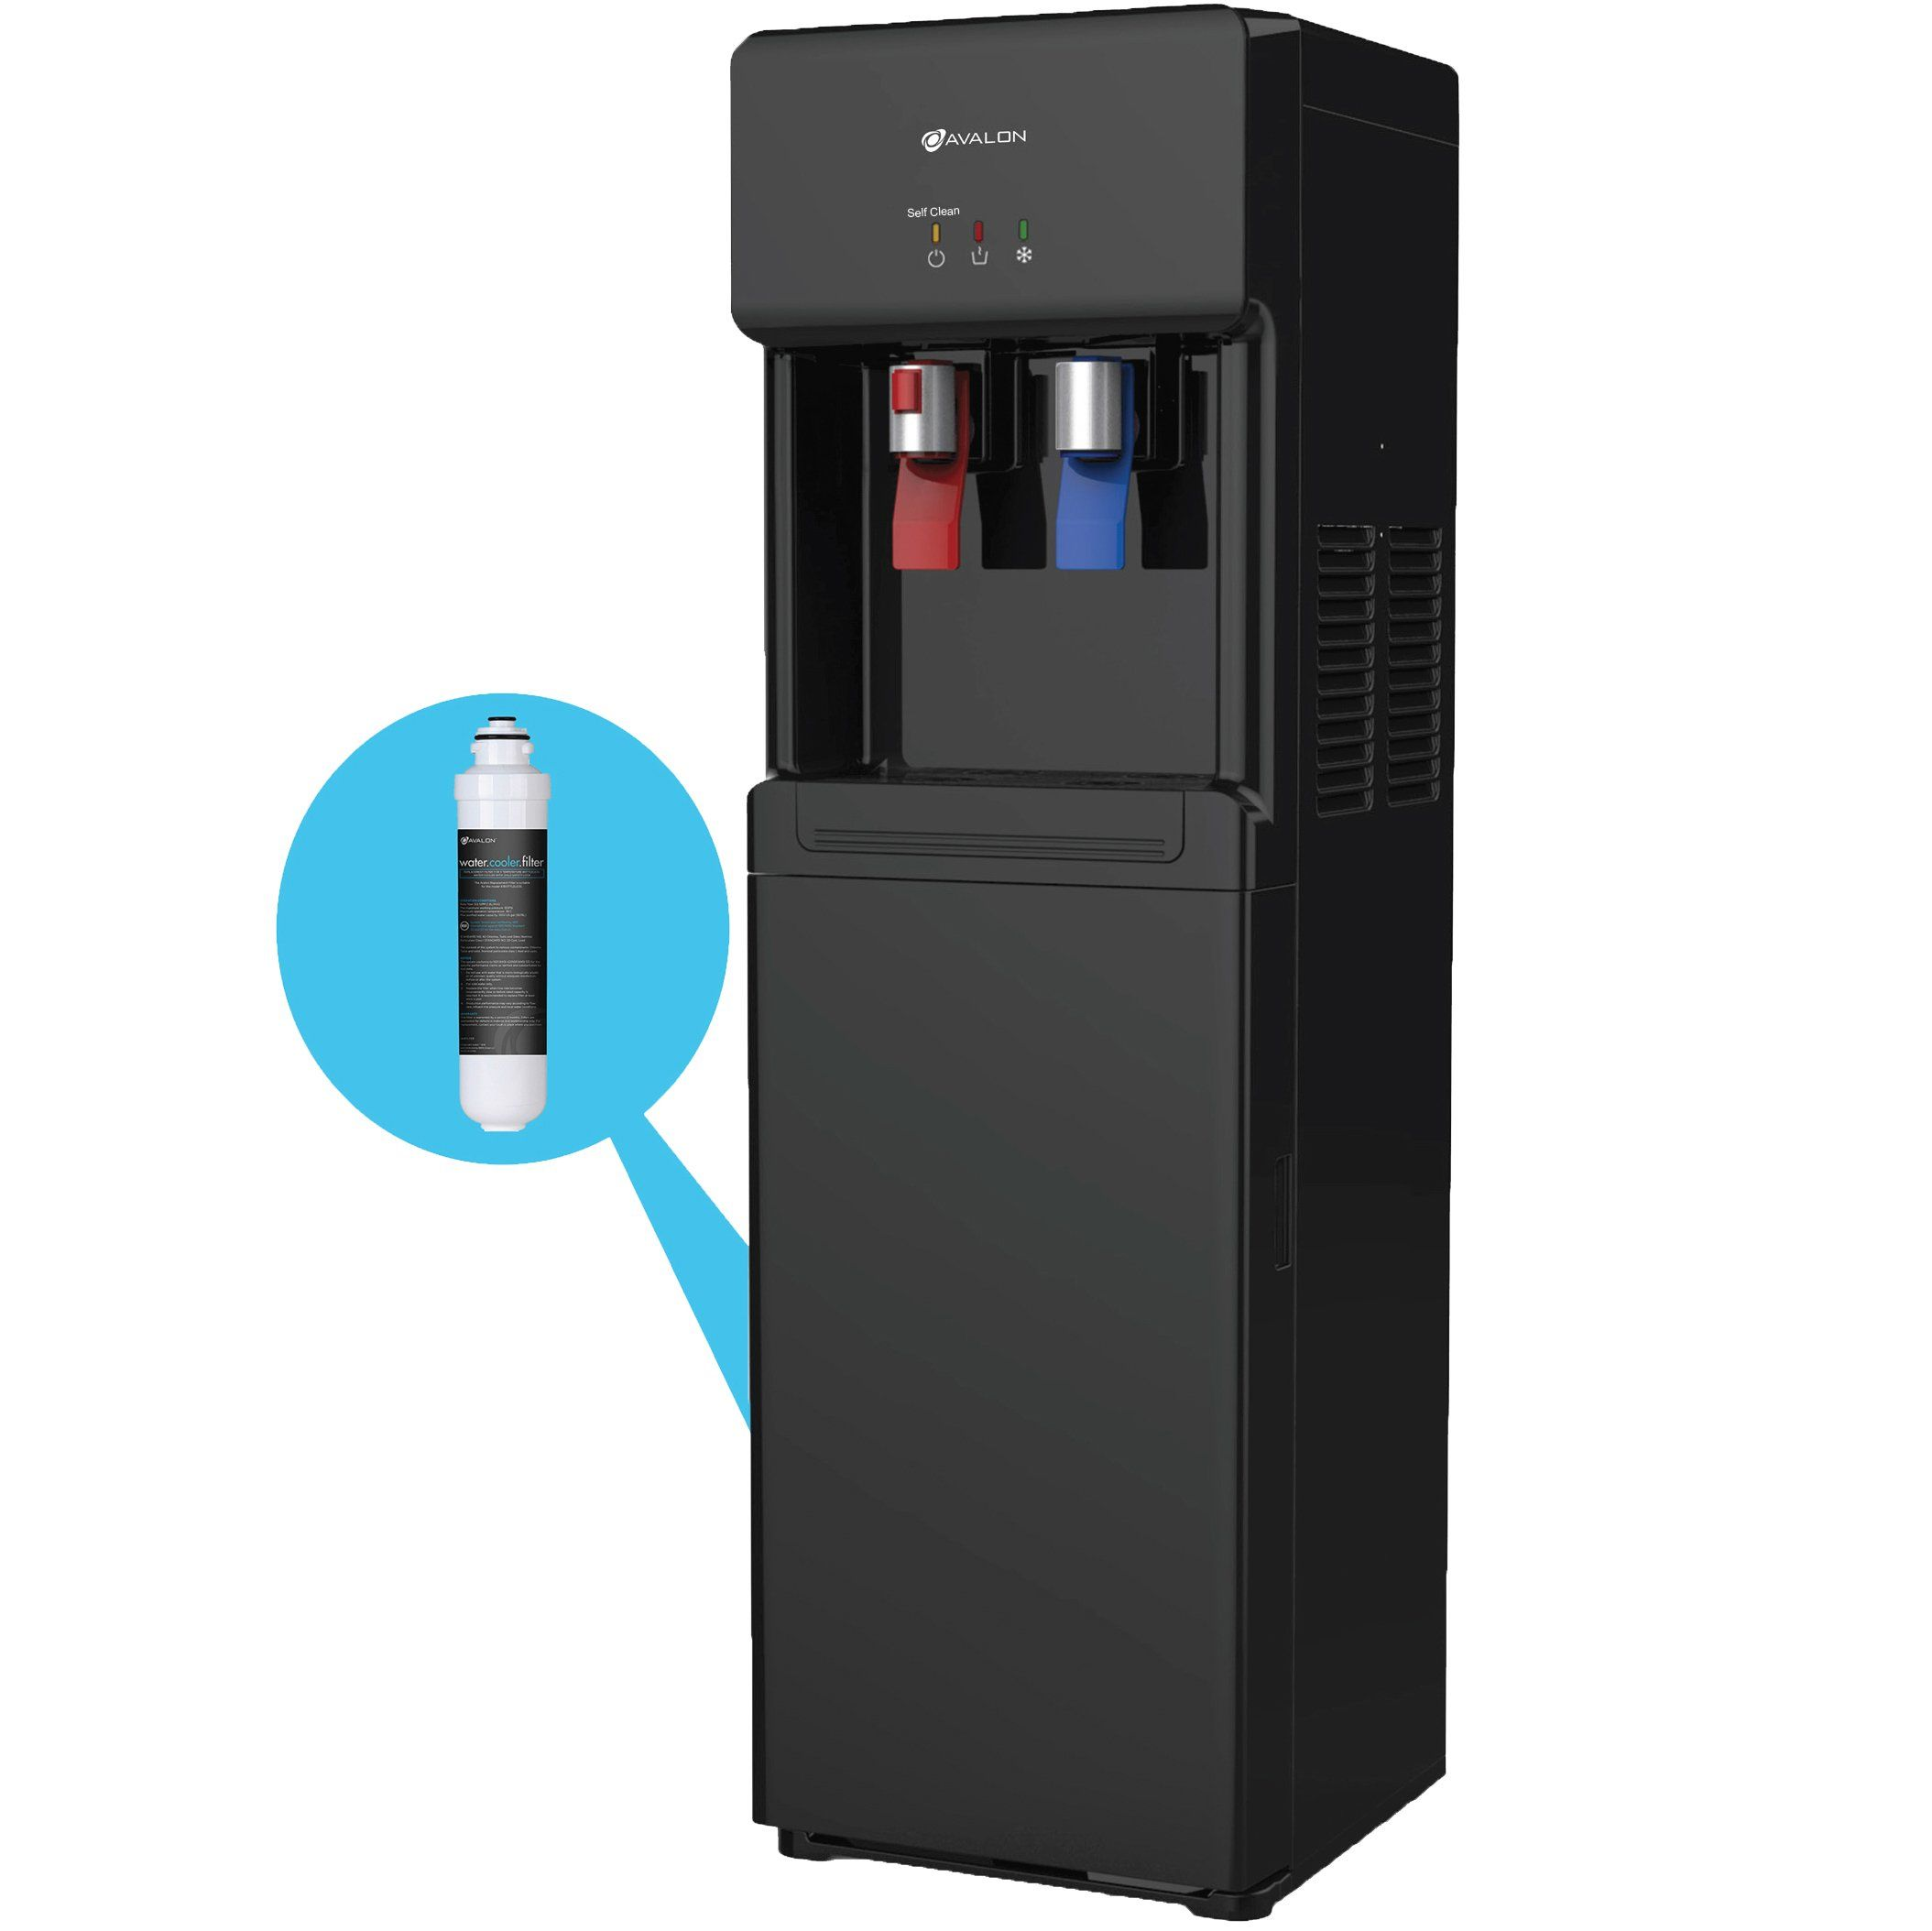 Avalon Self Cleaning Bottleless Water Cooler Dispenser with Filter ...